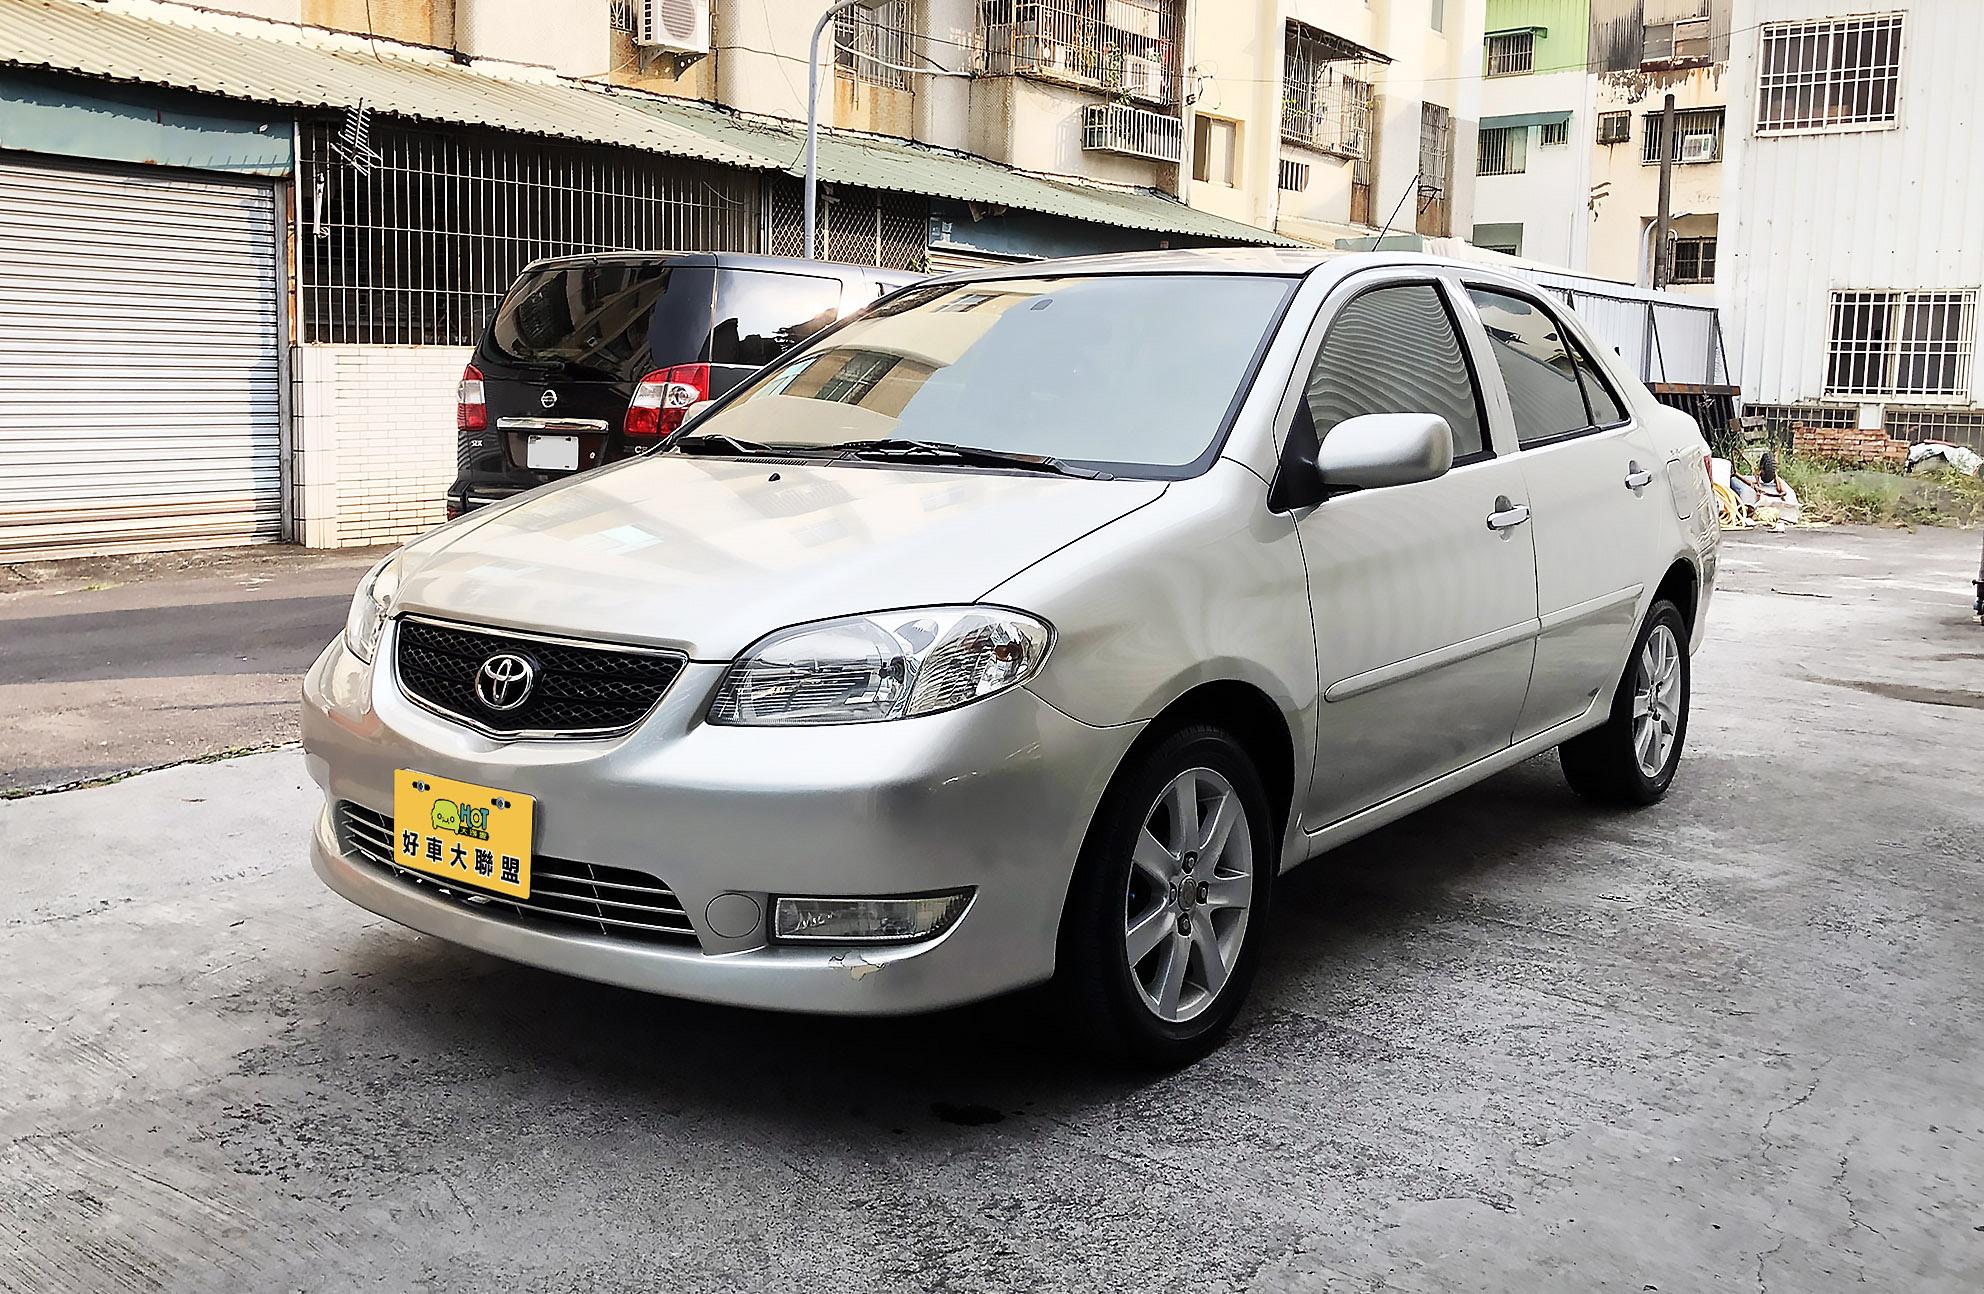 2003 Toyota 豐田 Vios